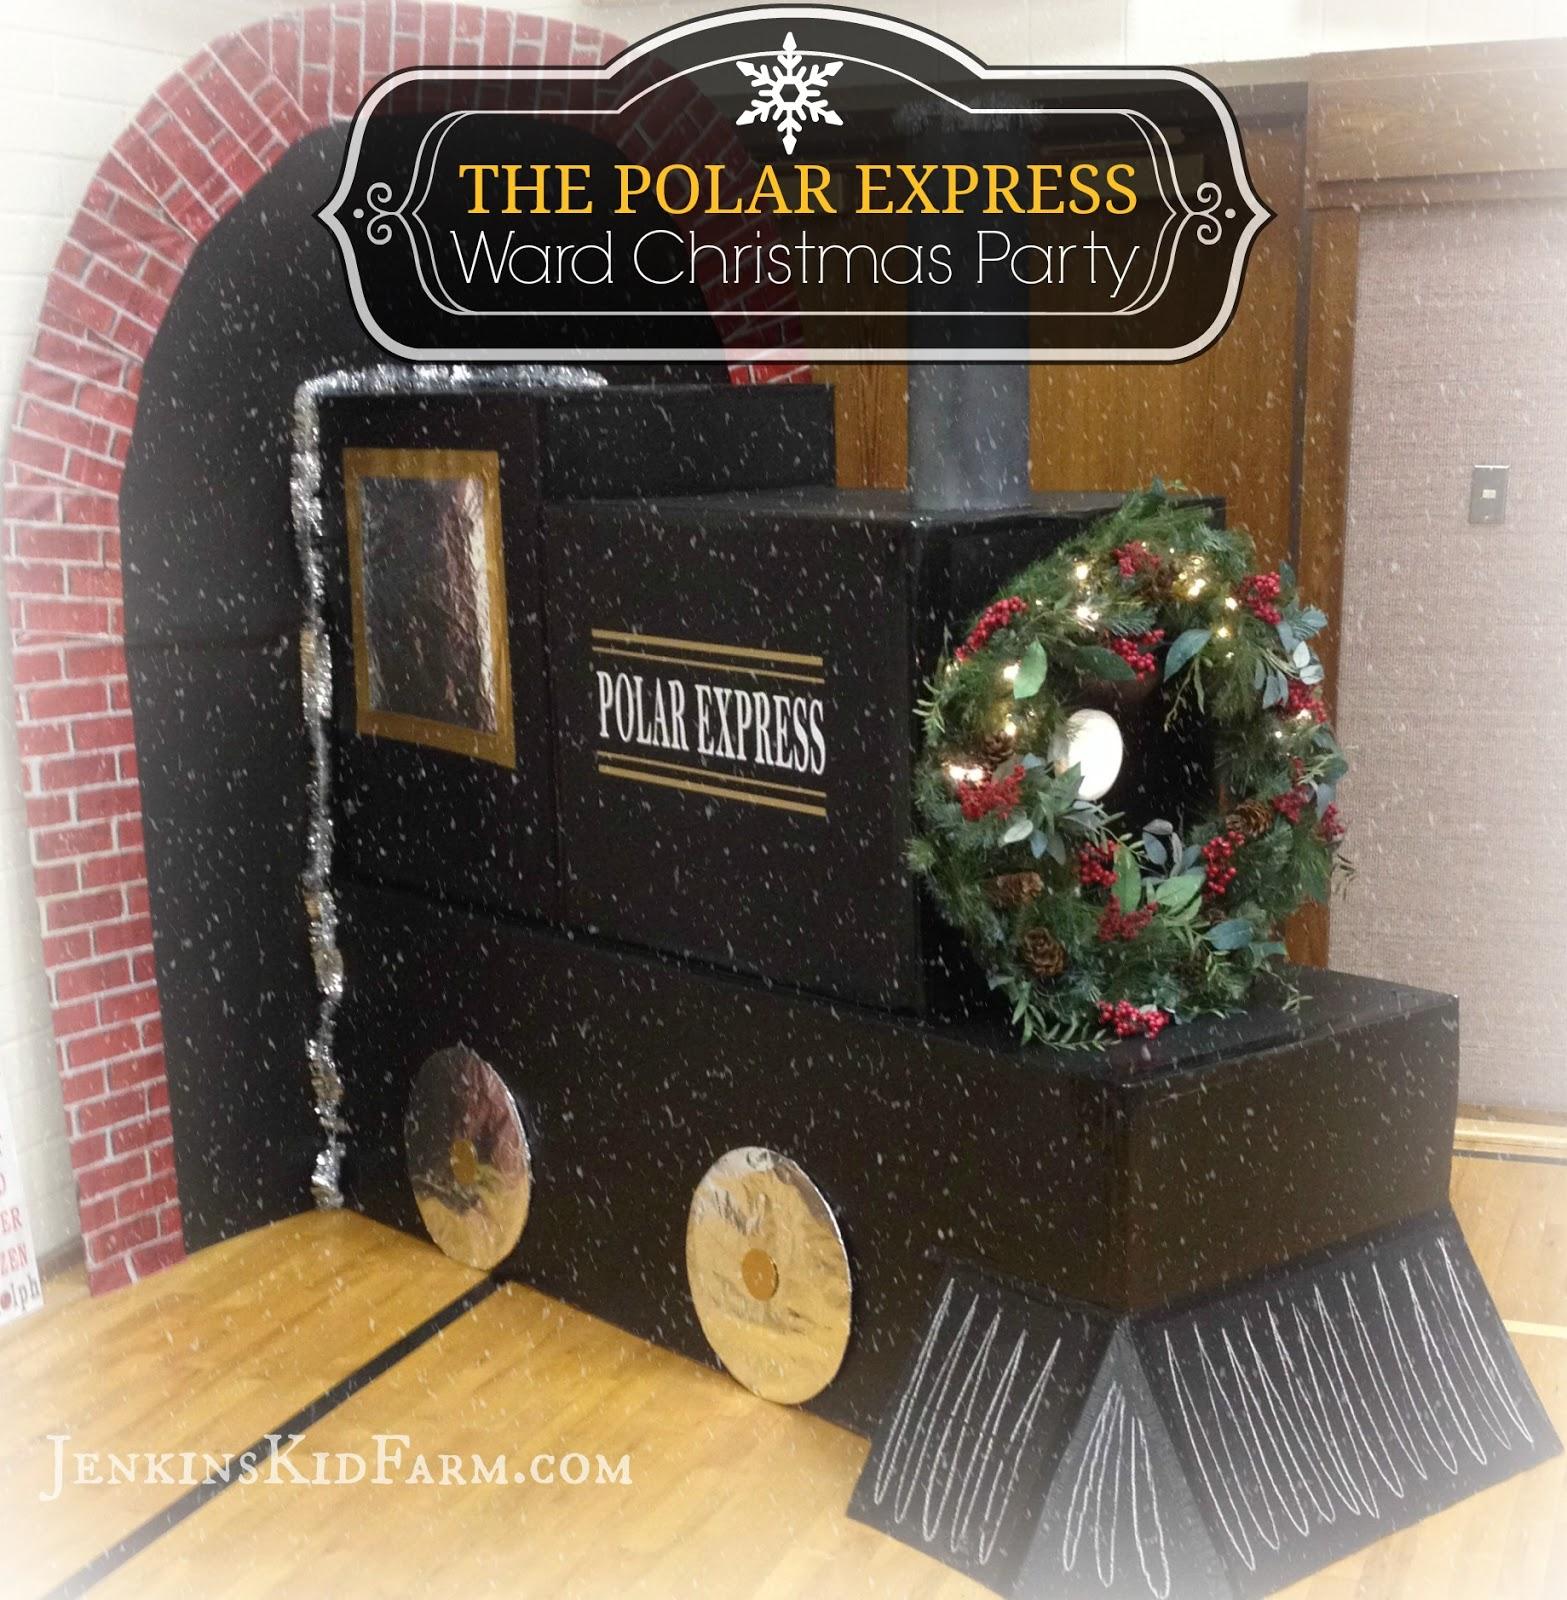 Ward Christmas Party Ideas Part - 25: Polar Express Ward Christmas Party